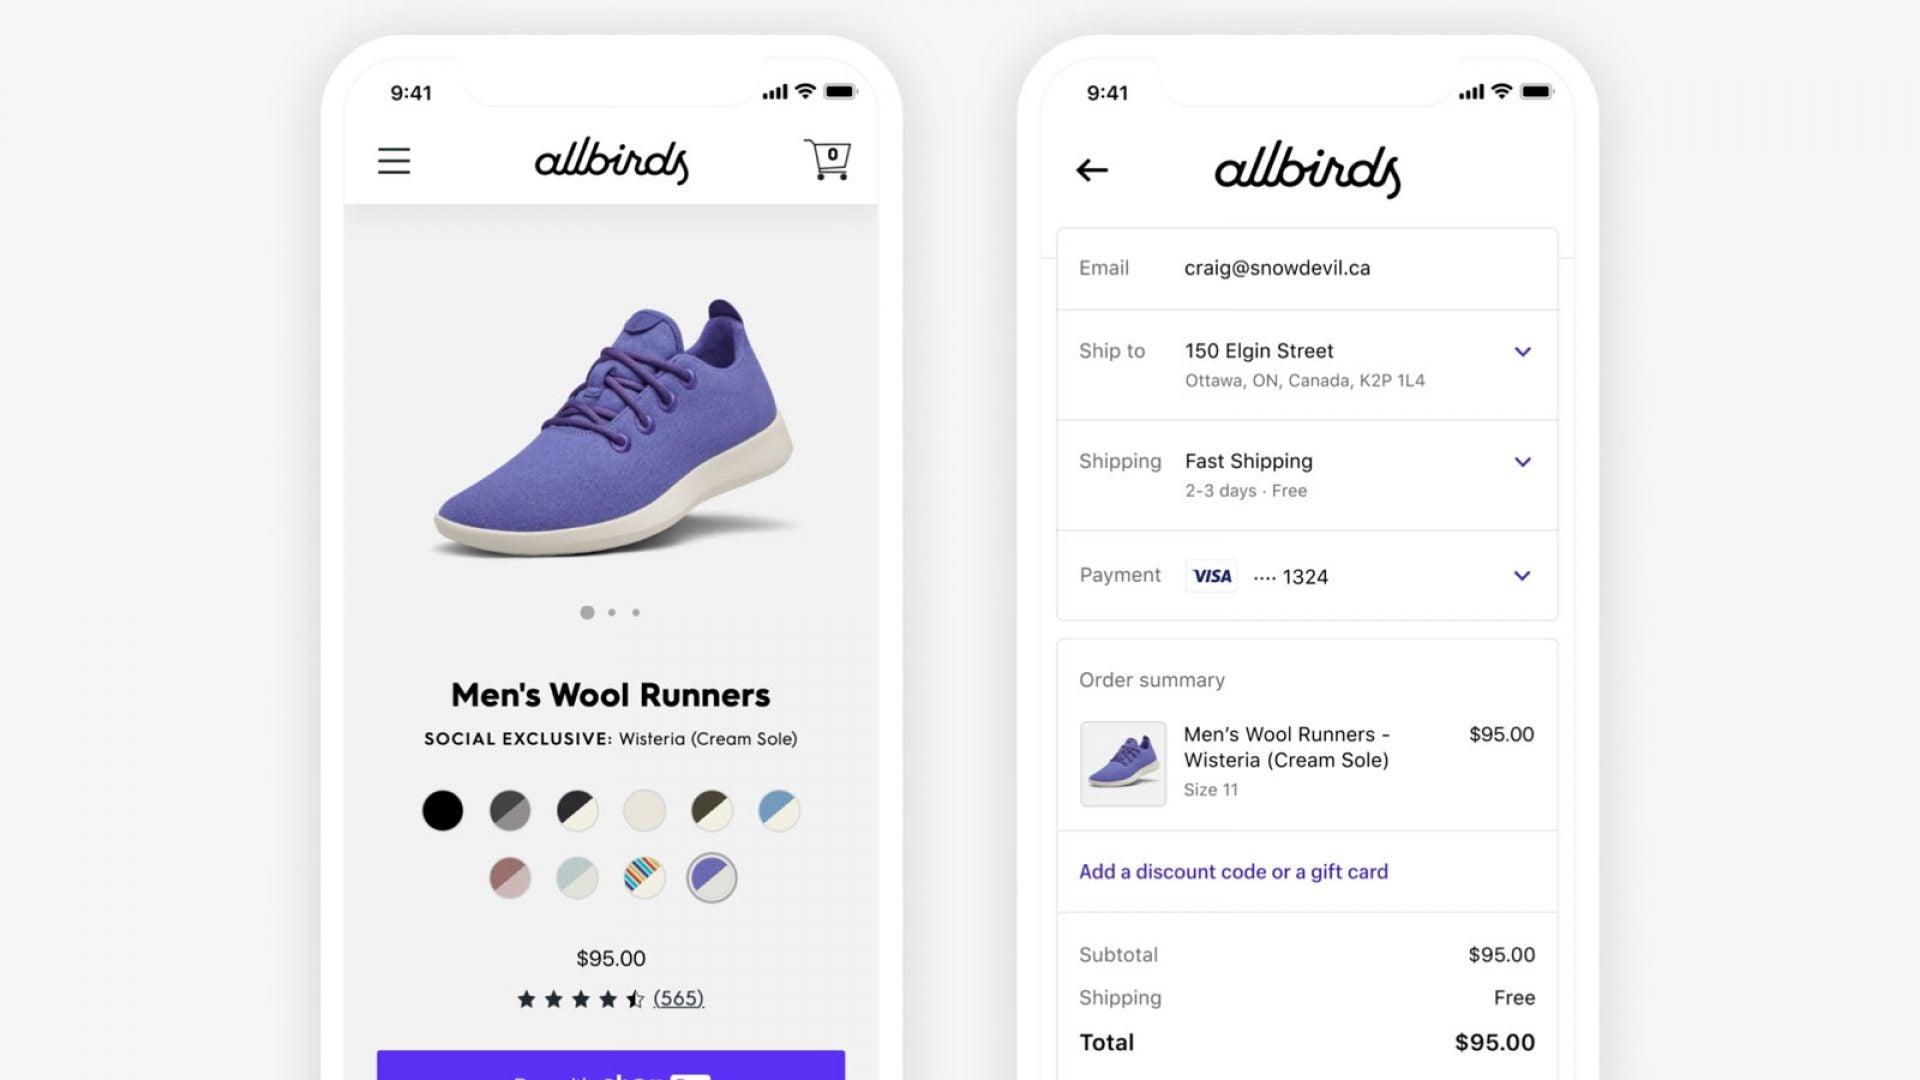 E-Commerce Platform Shopify Launches New Mobile App